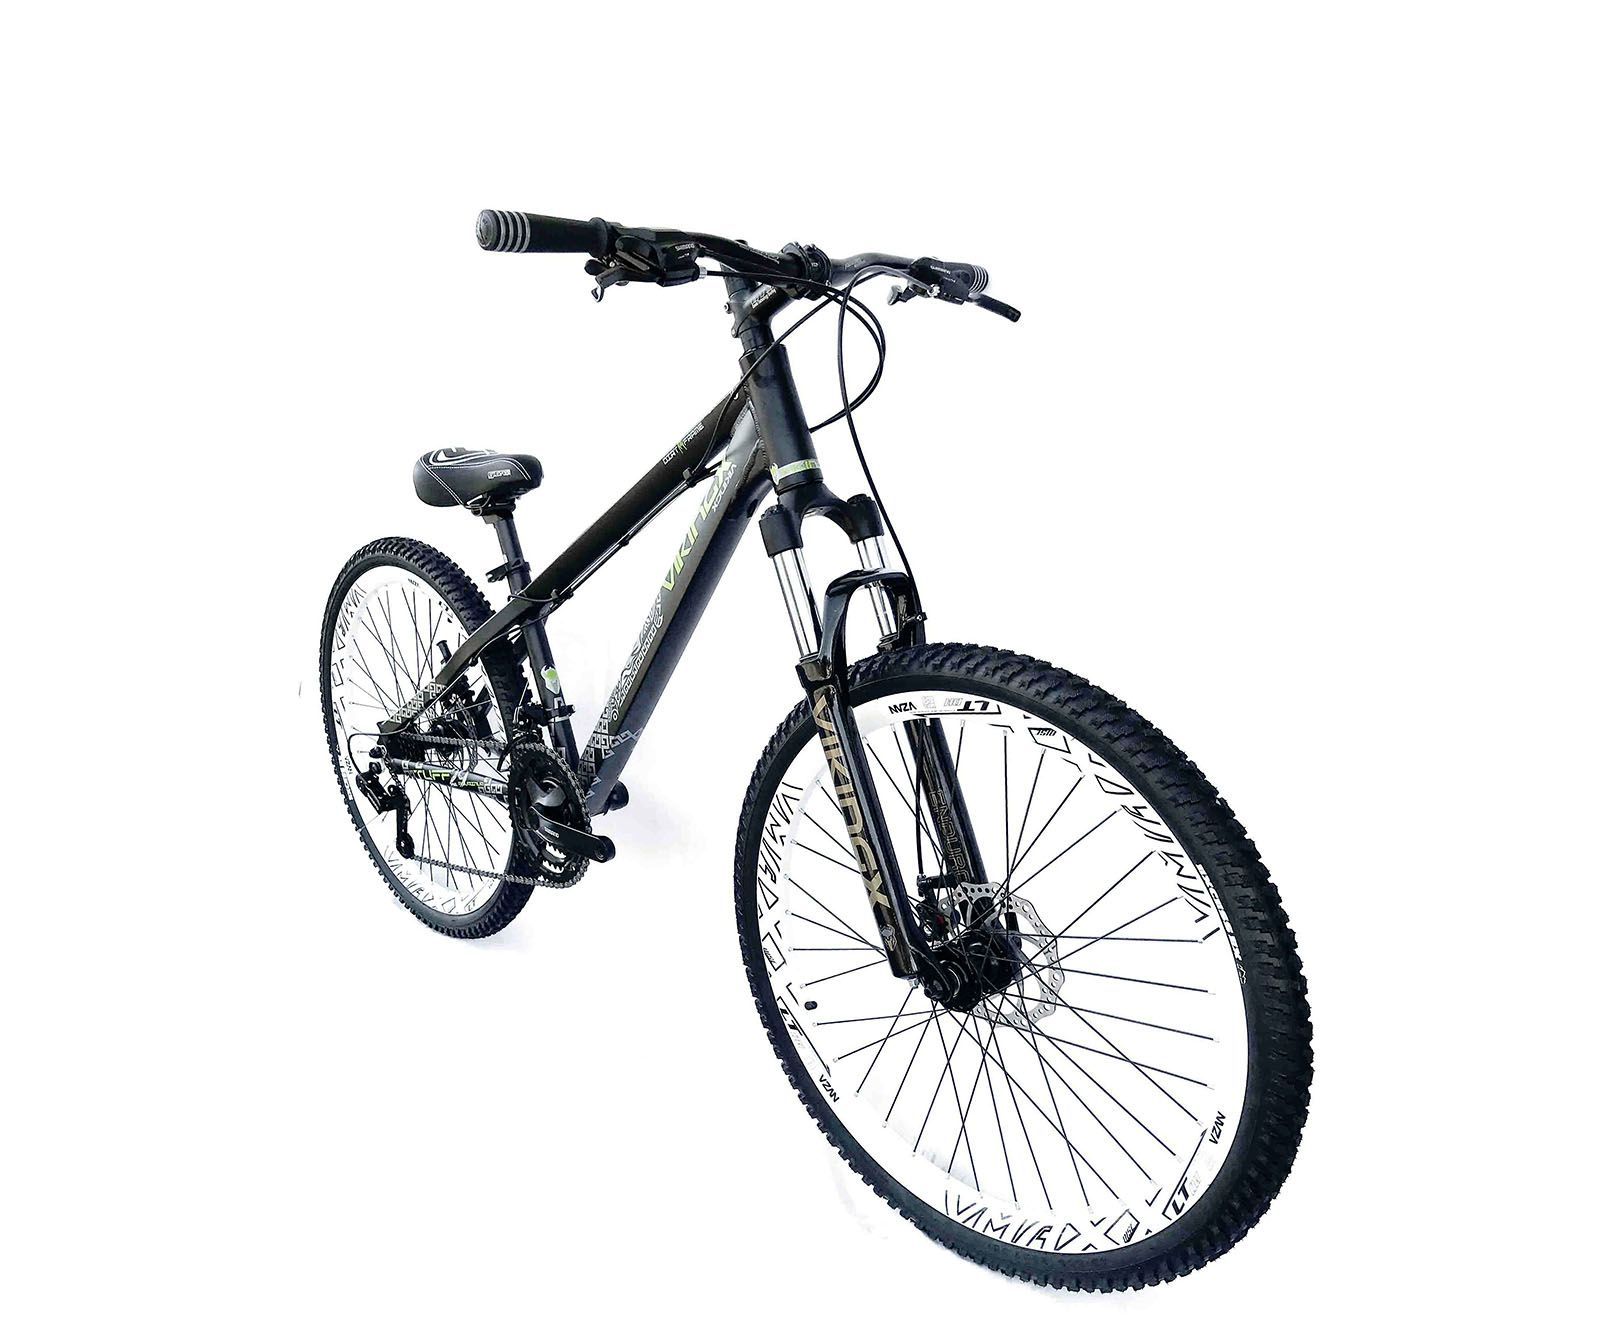 Bicicleta Viking Tuff 29 21v  Shimano Freio A Disco Aro Vmaxx Garfo Viking